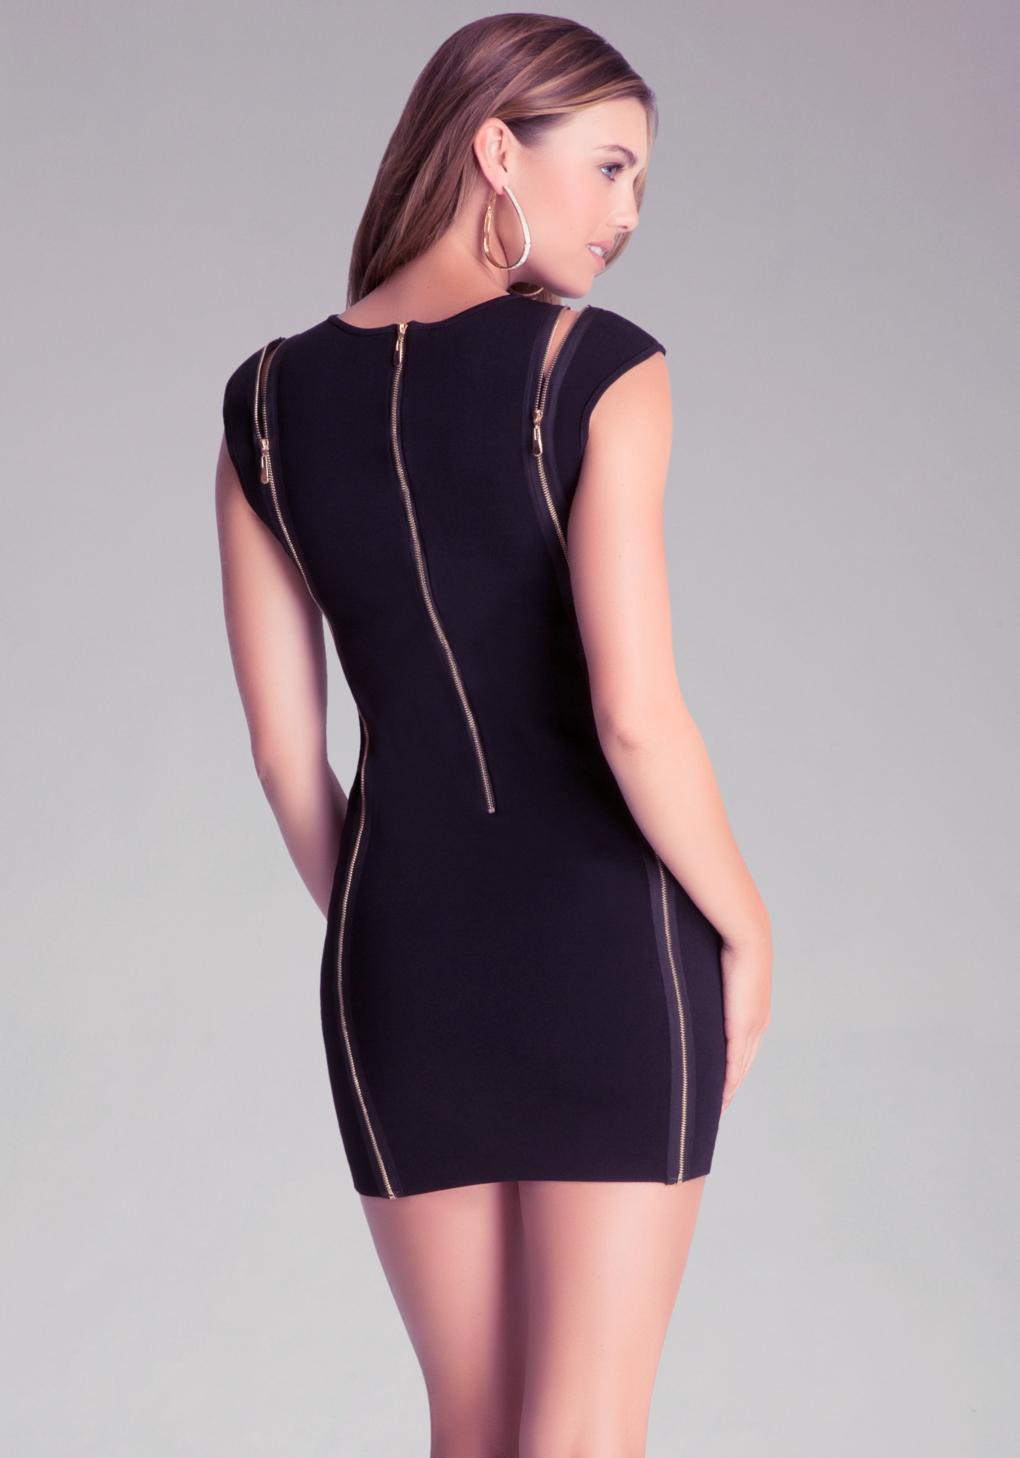 Lyst bebe zip detail dress in black for Bebe dresses wedding guest